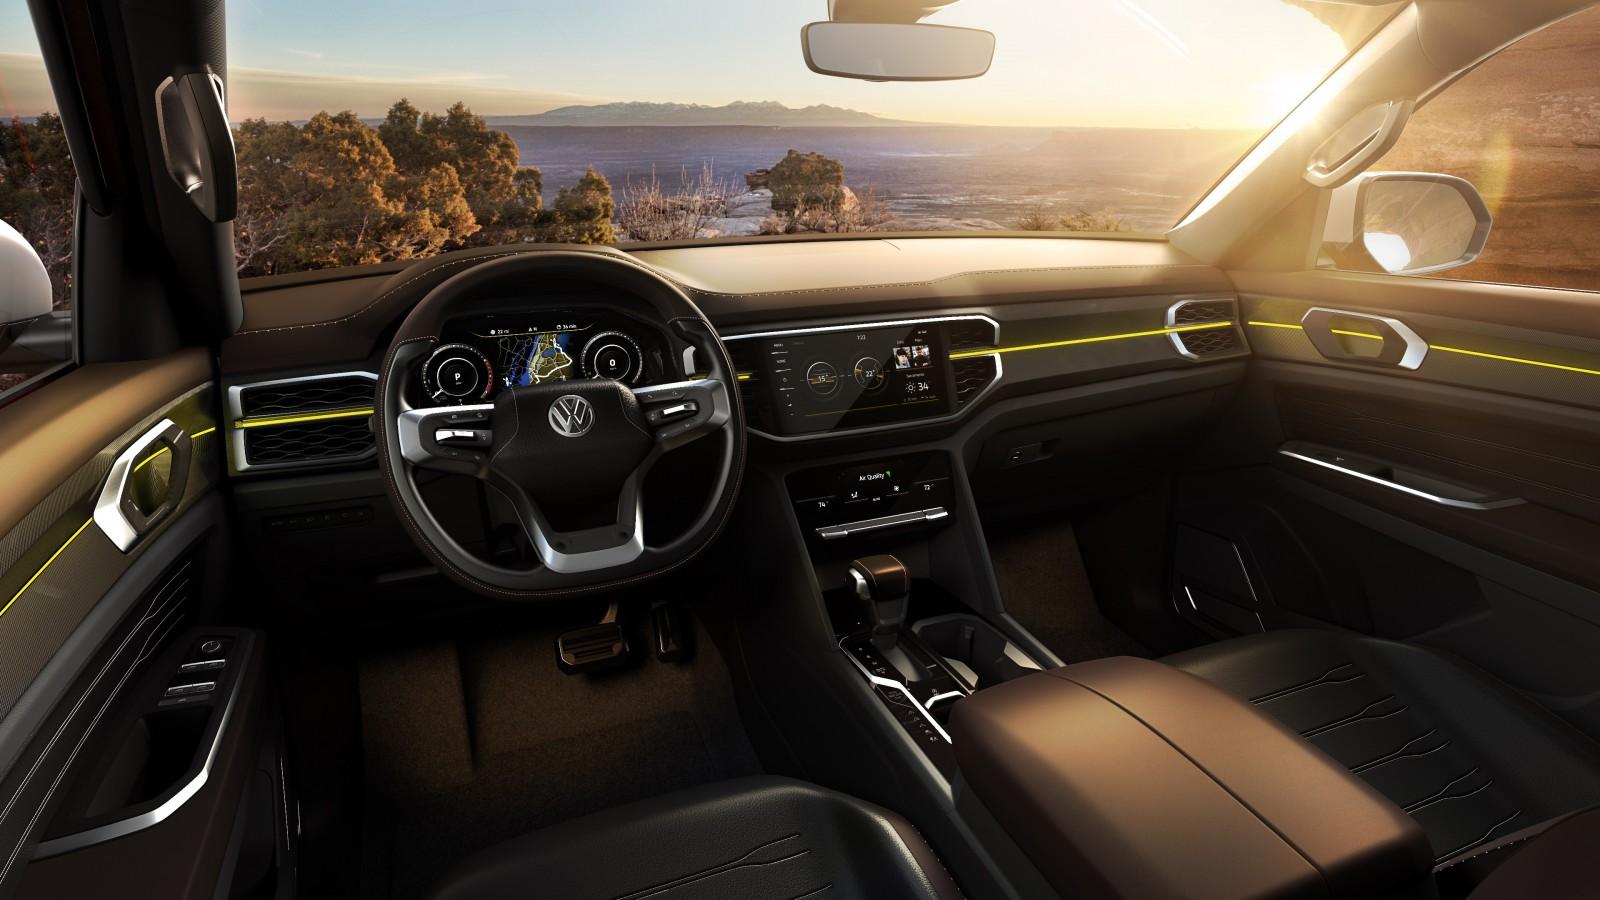 2018 Volkswagen Atlas Tanoak Pickup Truck Concept 4K 2 Wallpaper | HD Car Wallpapers | ID #10094